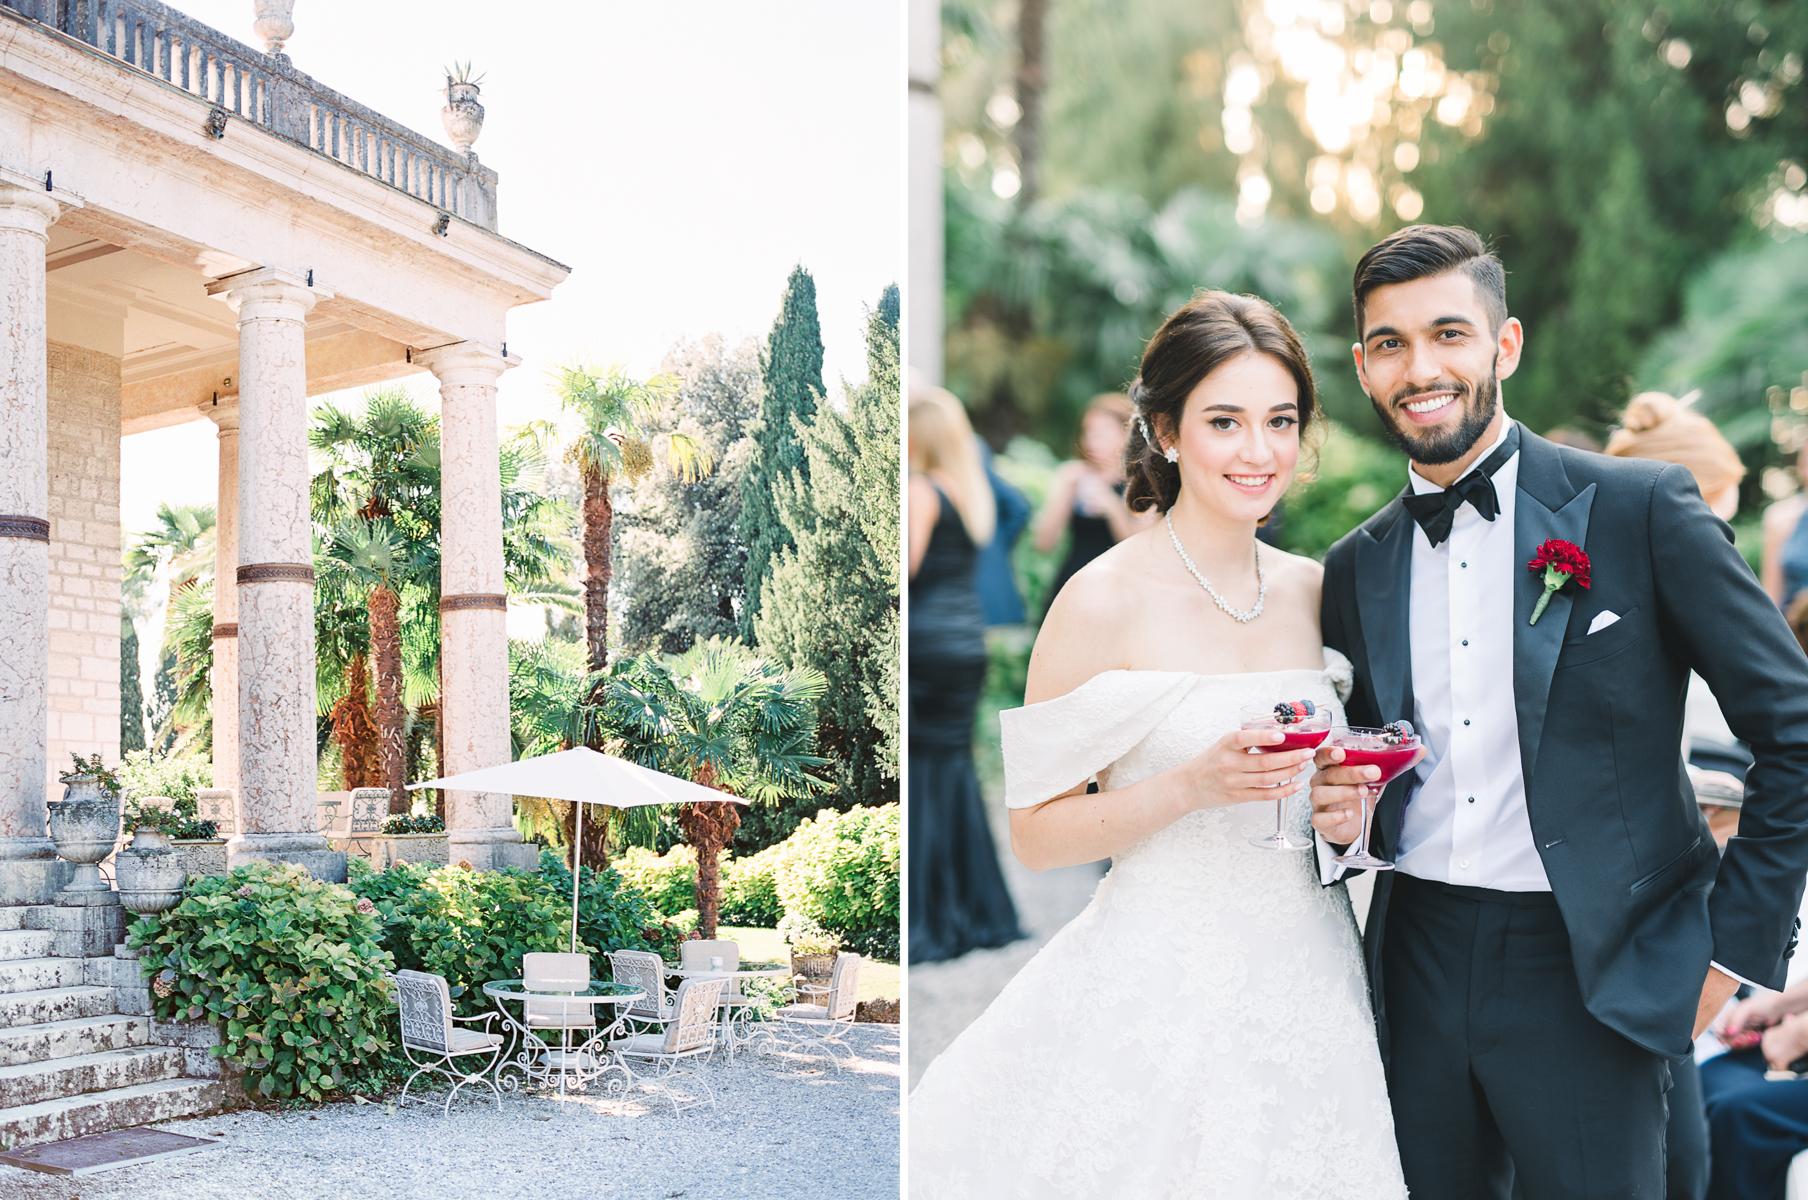 Palace_Villa_Cortine_Hotel_Italian_Wedding_Photographer_Sirmione_AKP-20-Nicole_Khudoyan_Mitchell_Kapoor.jpg